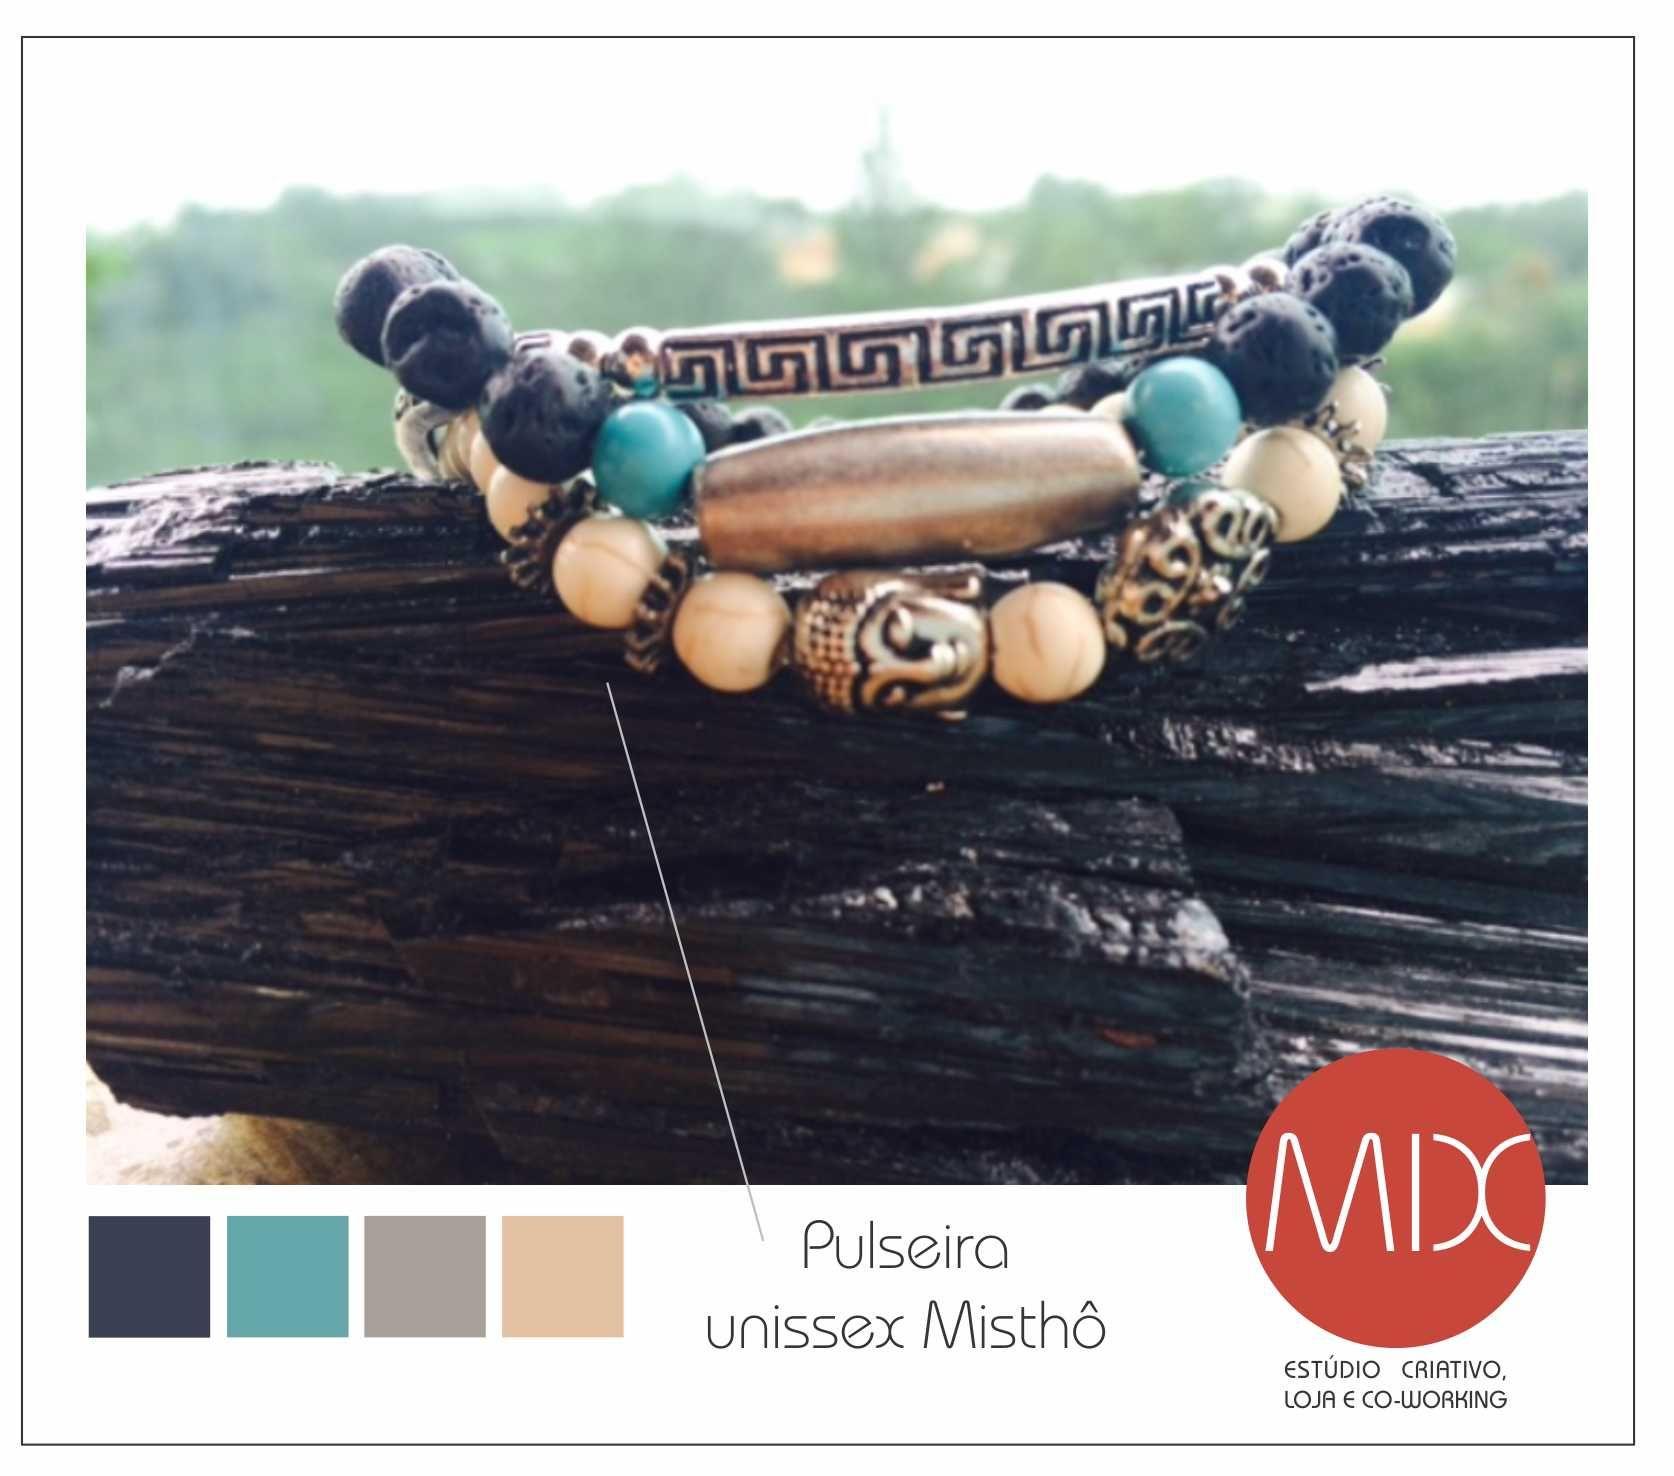 Masculino e feminino, temos pulseiras! A Misthô chegou para atender a tendência de manter-se sofisticadamente único. #themixbazar